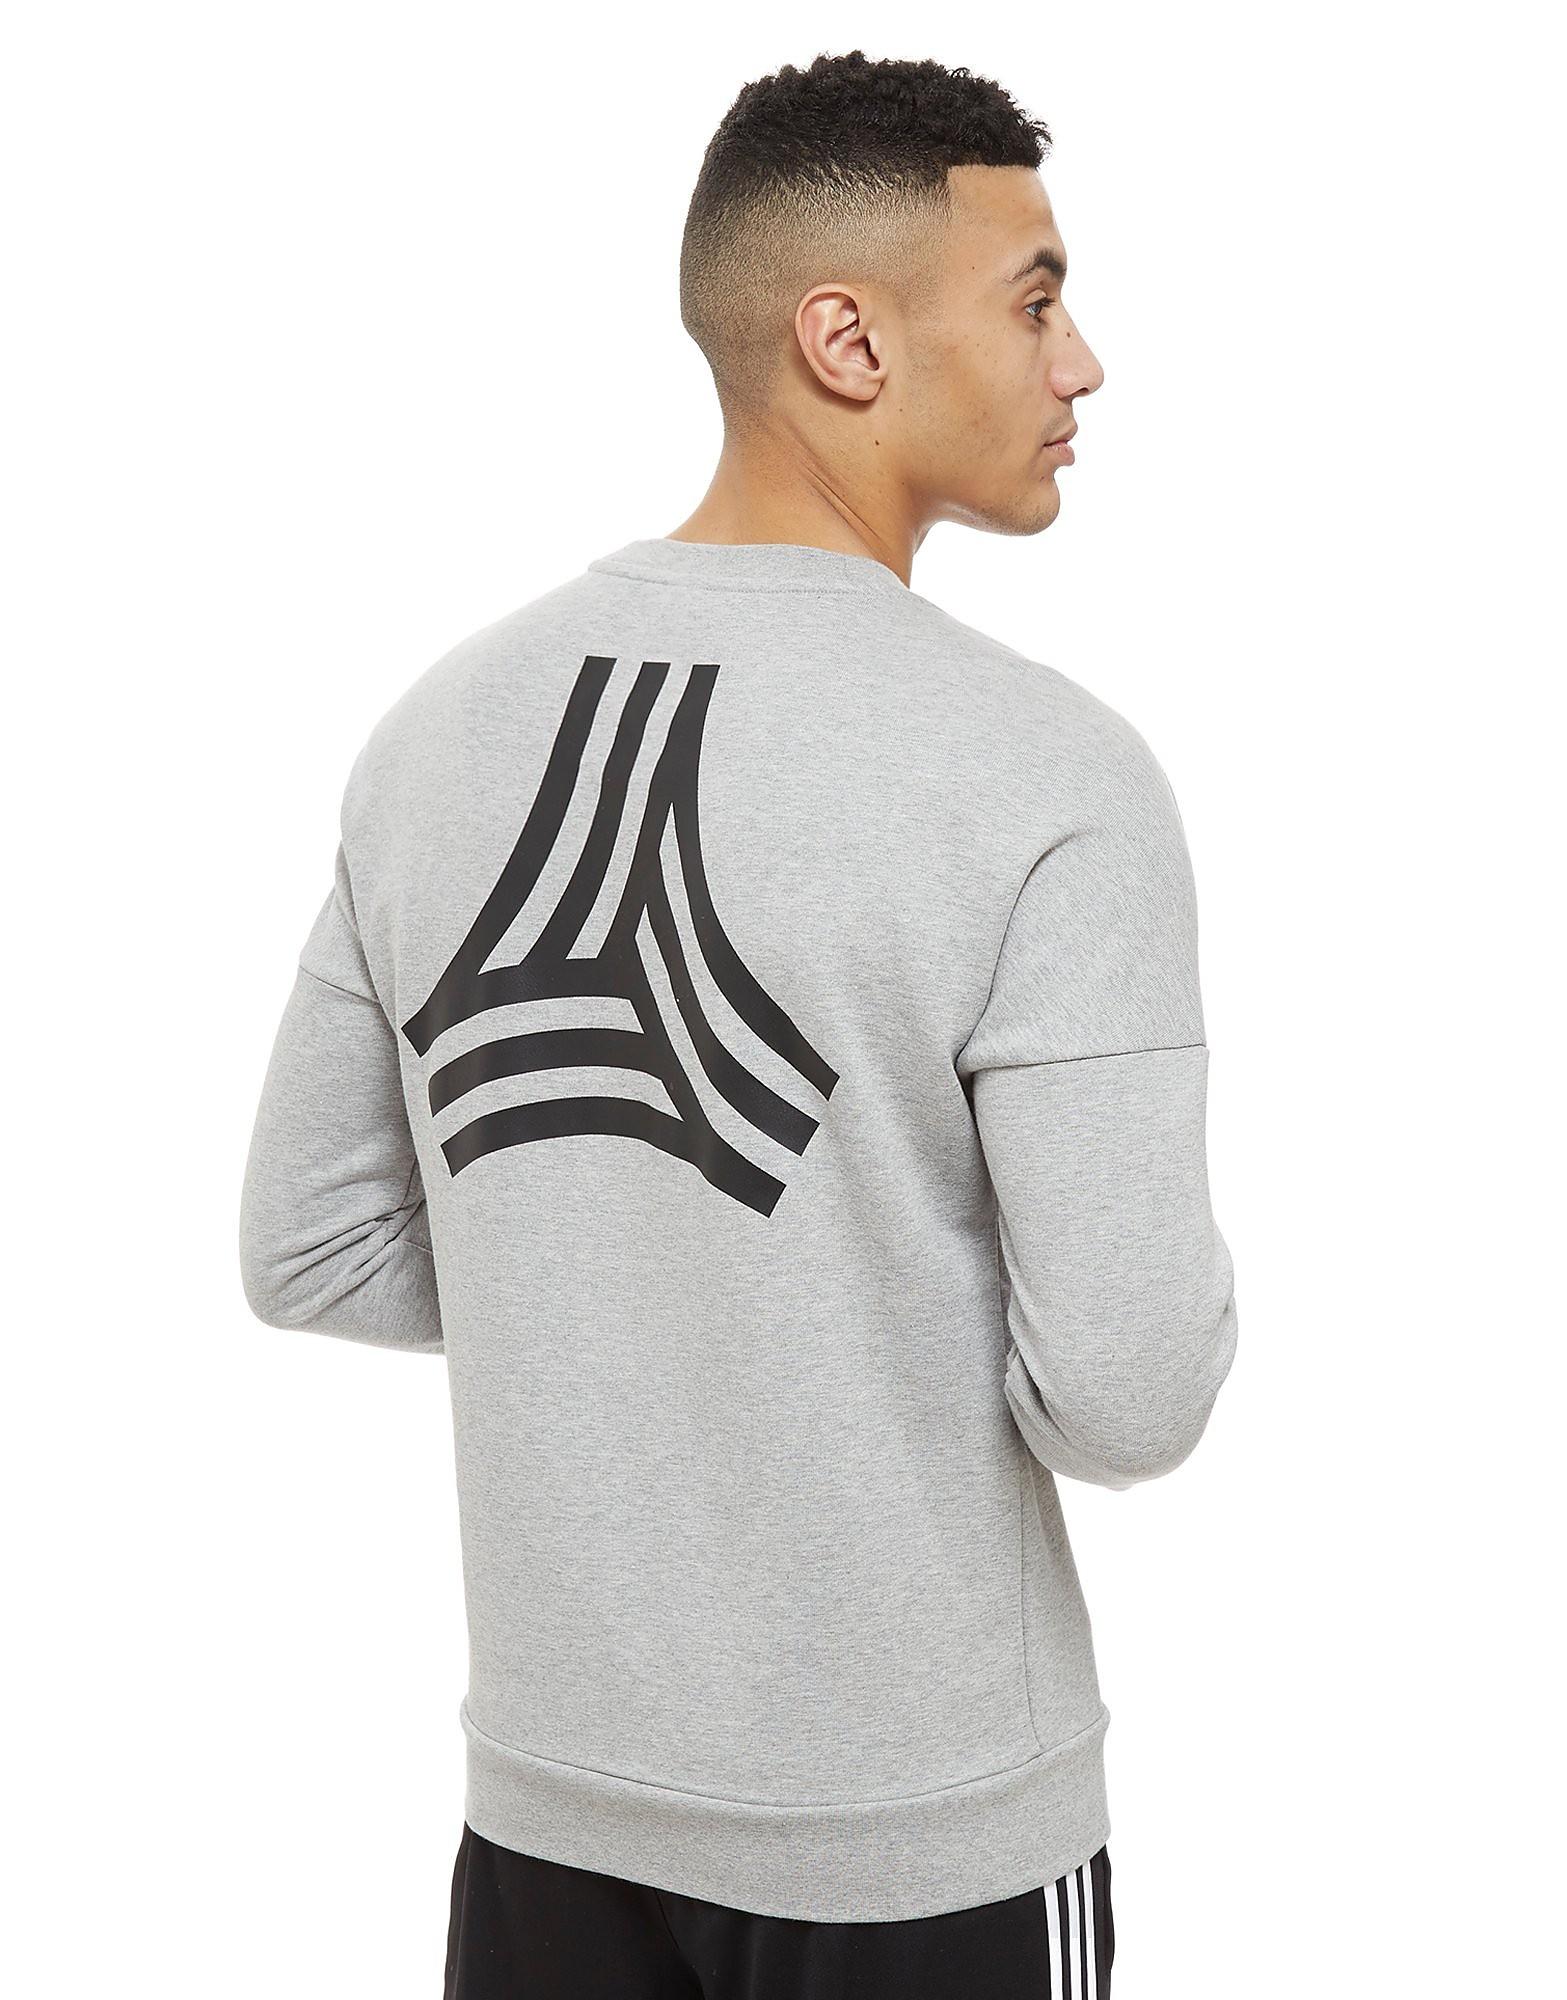 adidas Tango Rundhalsausschnitt Sweatshirt